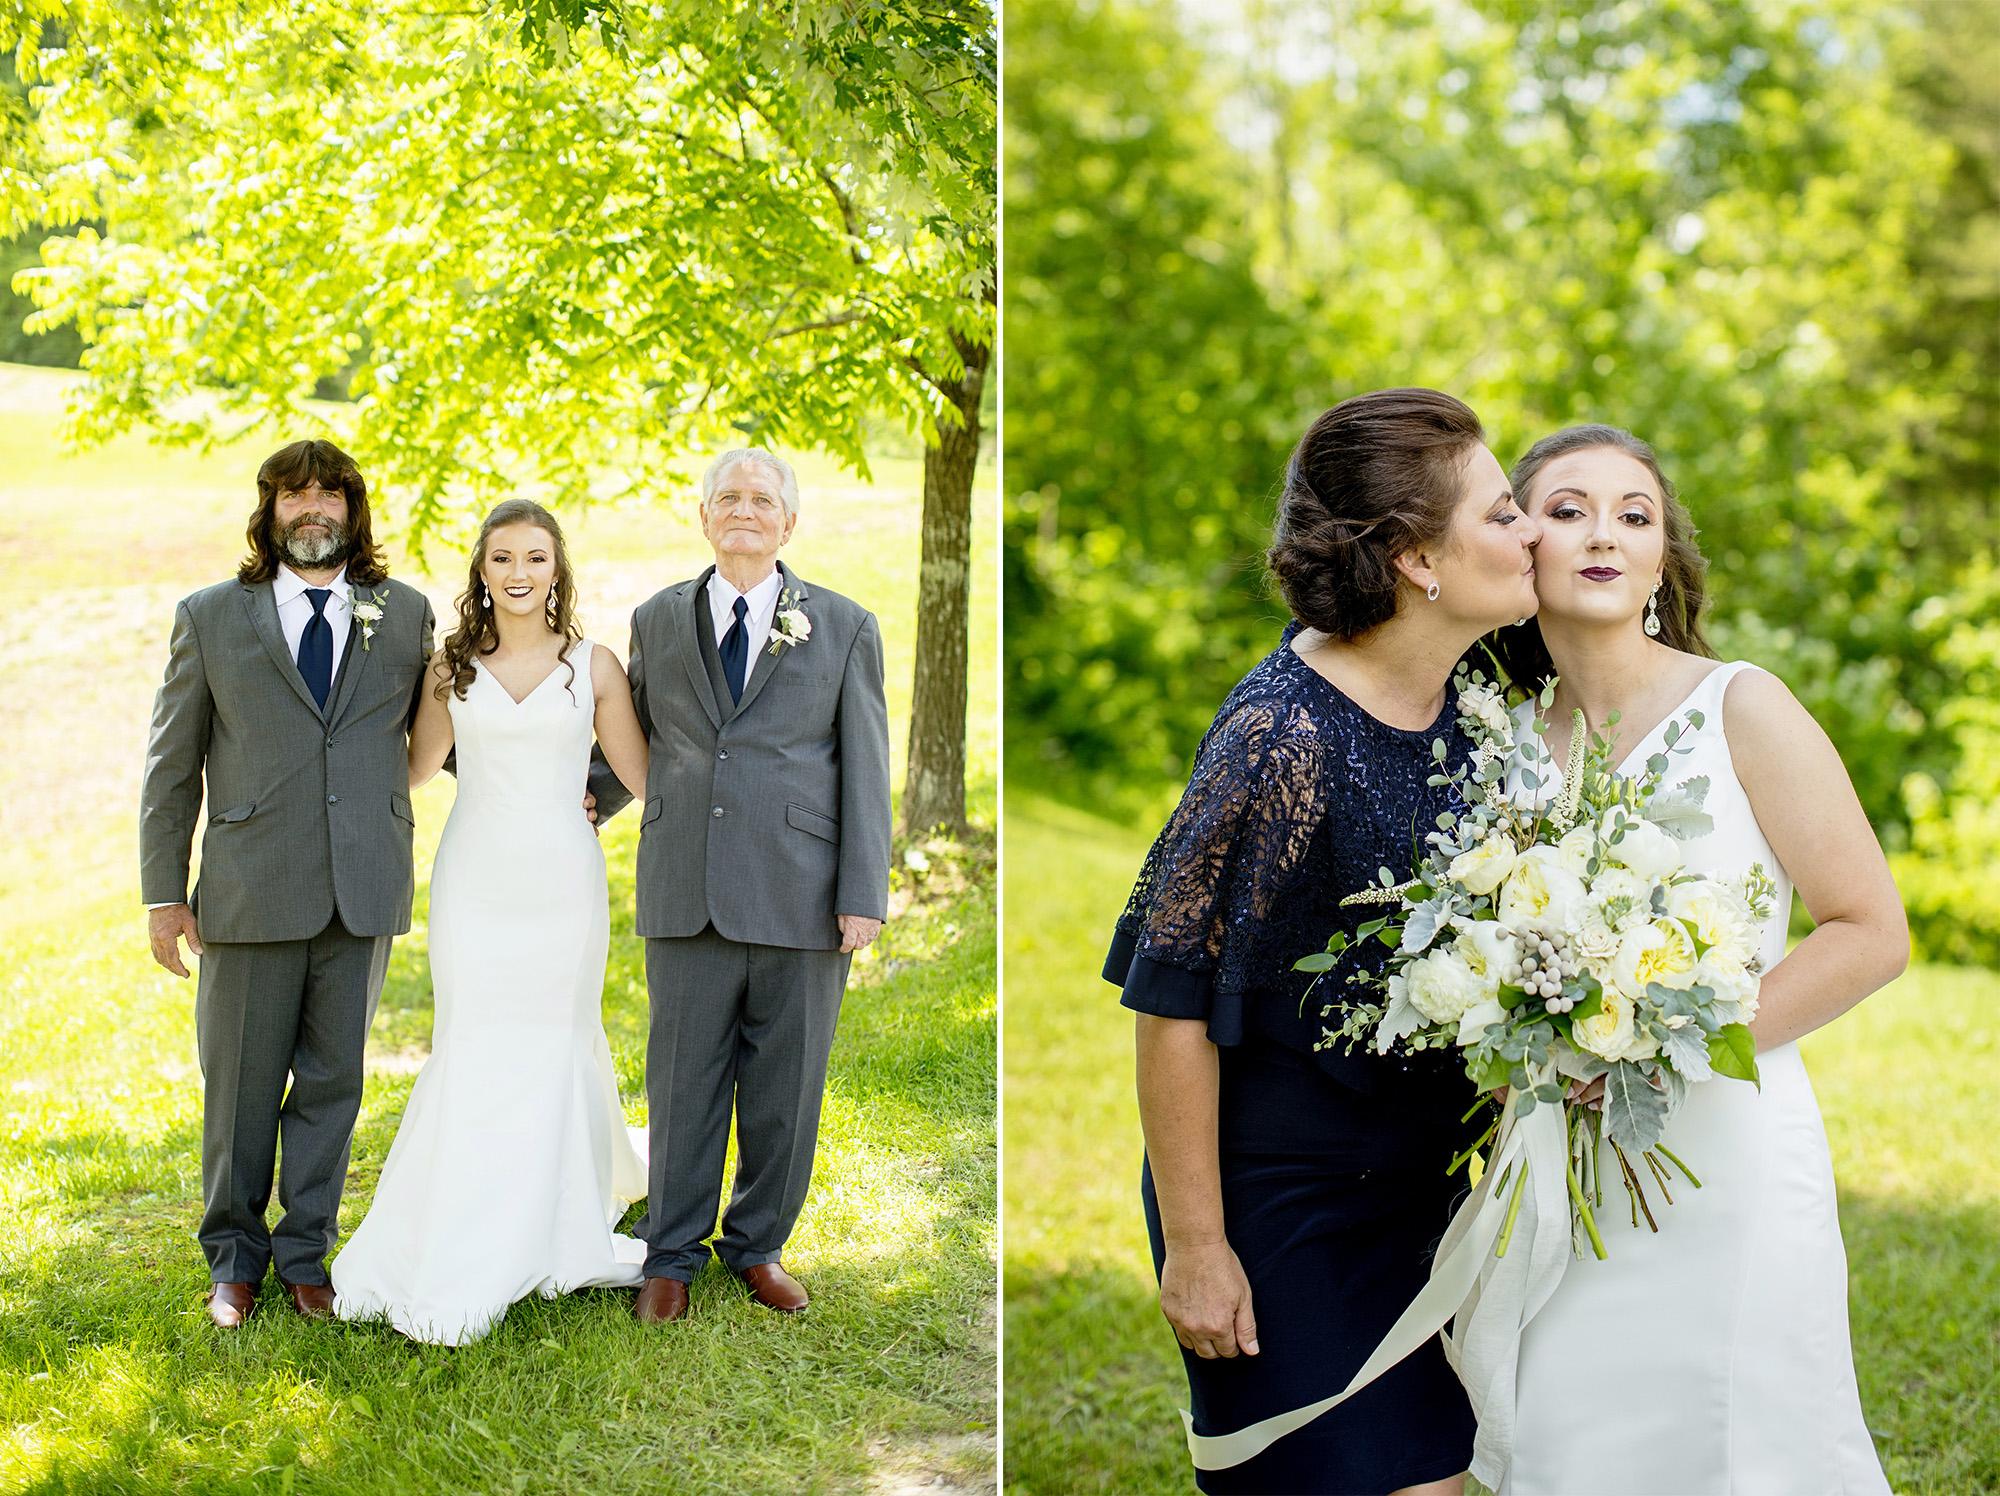 Seriously_Sabrina_Photography_Red_River_Gorge_Wedding_Barn_Robinson37.jpg